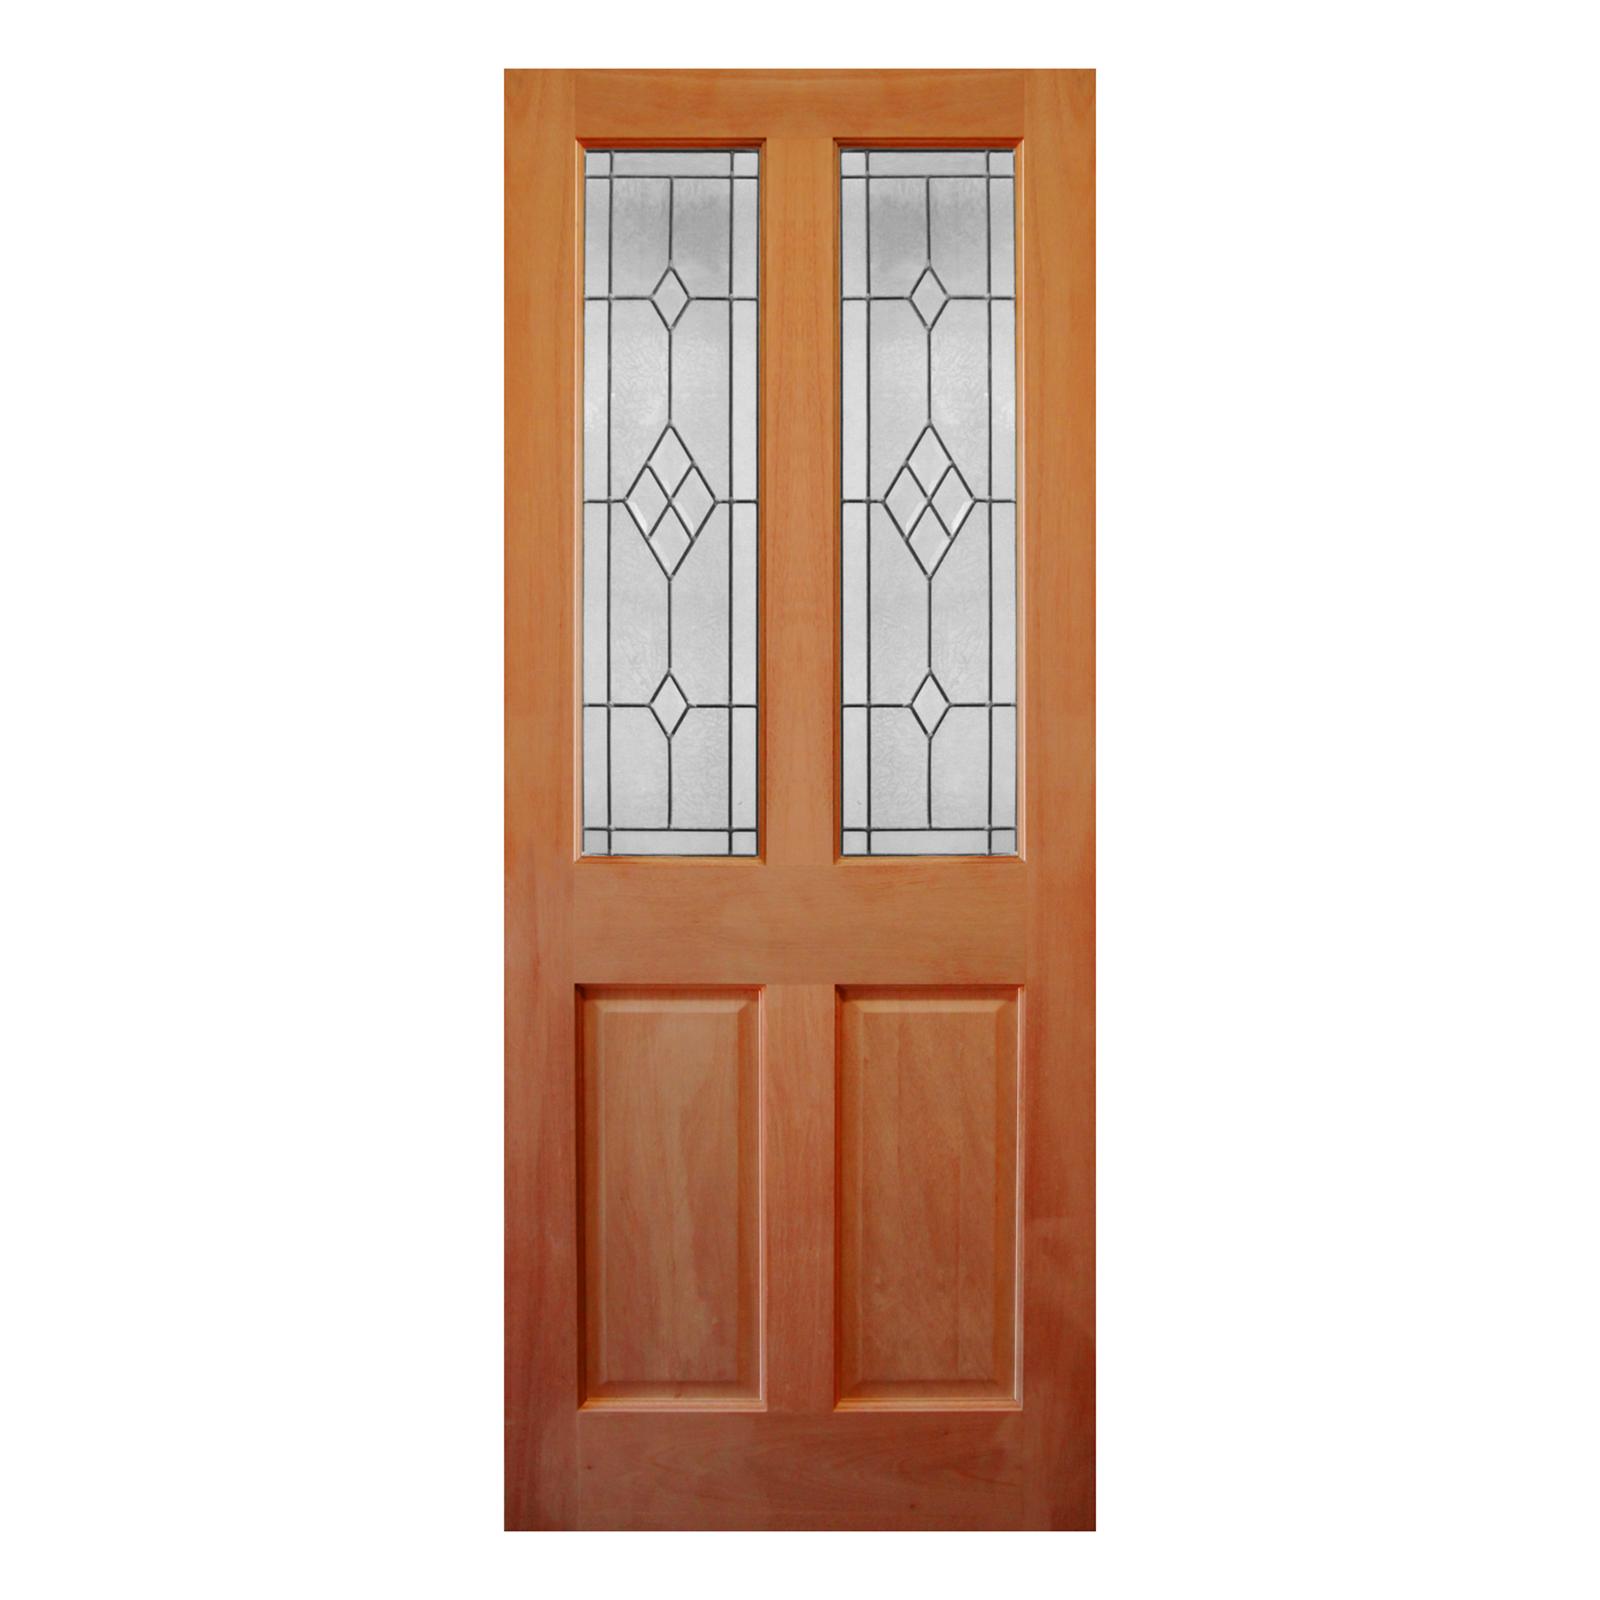 Corinthian Doors 2040 X 820 X 40mm Windsor Bevelled Diamond Jewel Entrance Door Beveled Glass Timber Panelling Entrance